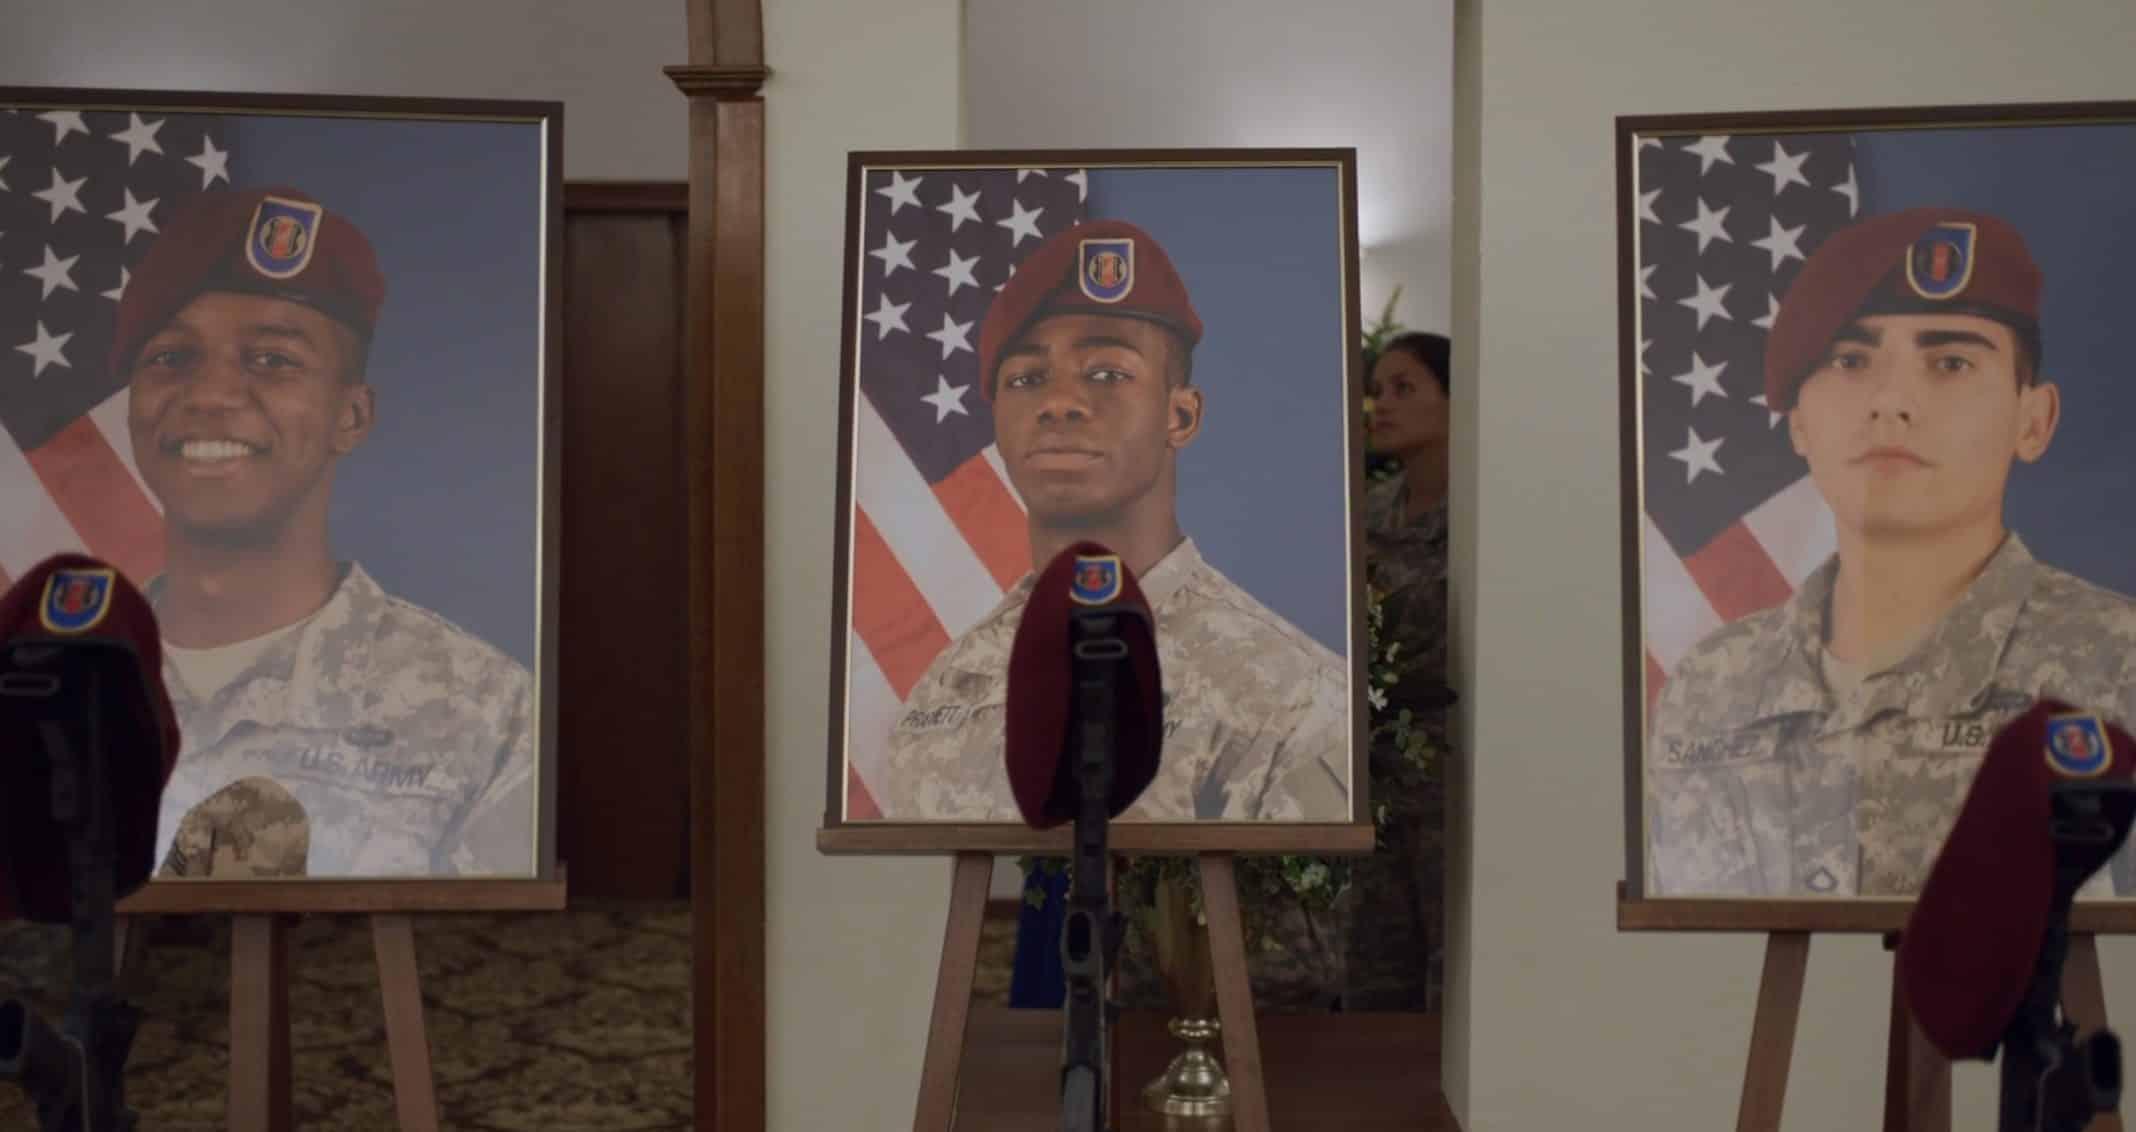 Craig's memorial